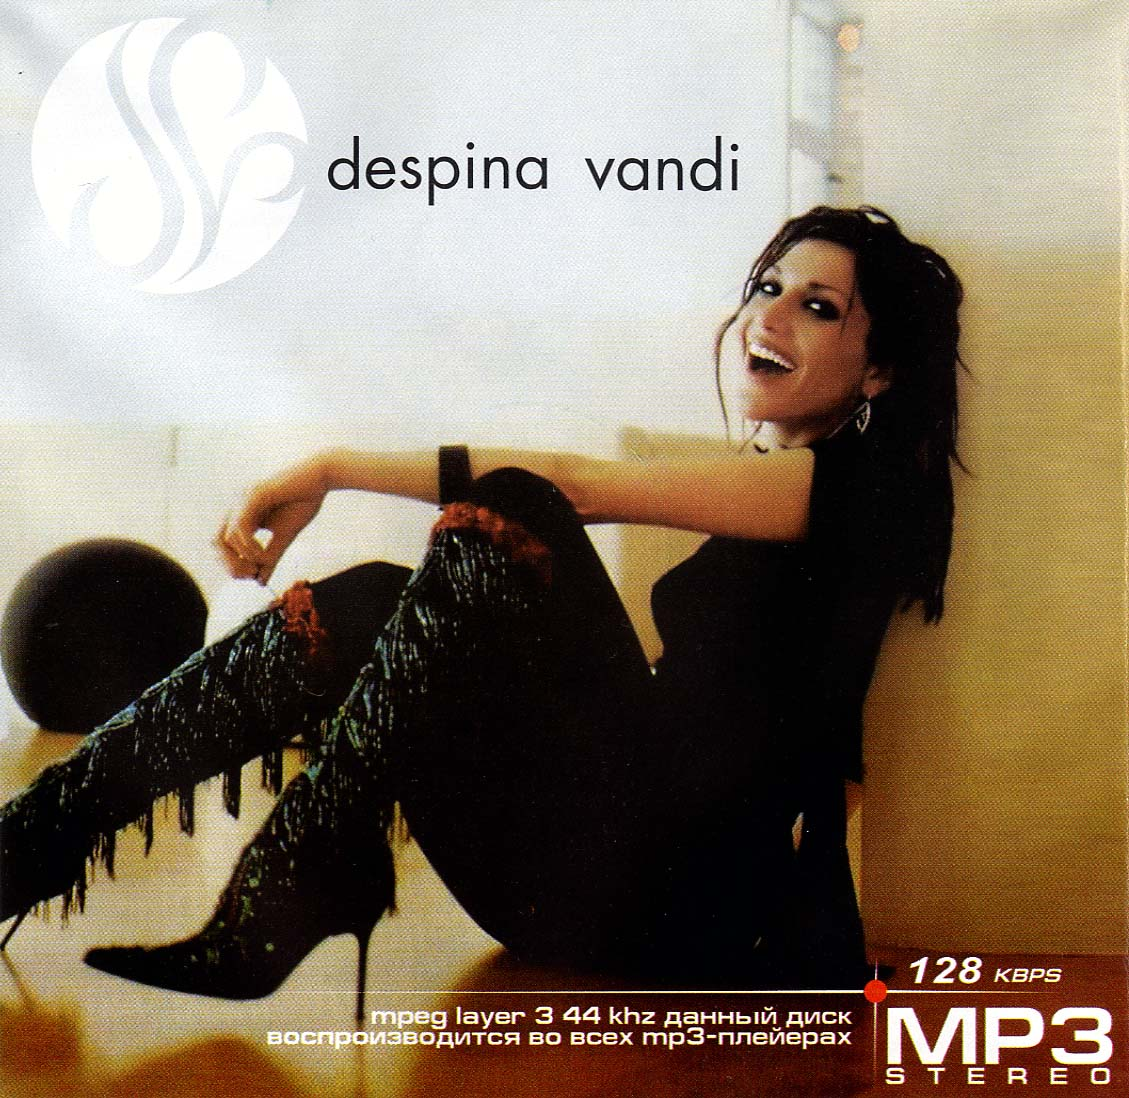 Все клипы despina vandi. Видеоклипы despina vandi скачать клипы.